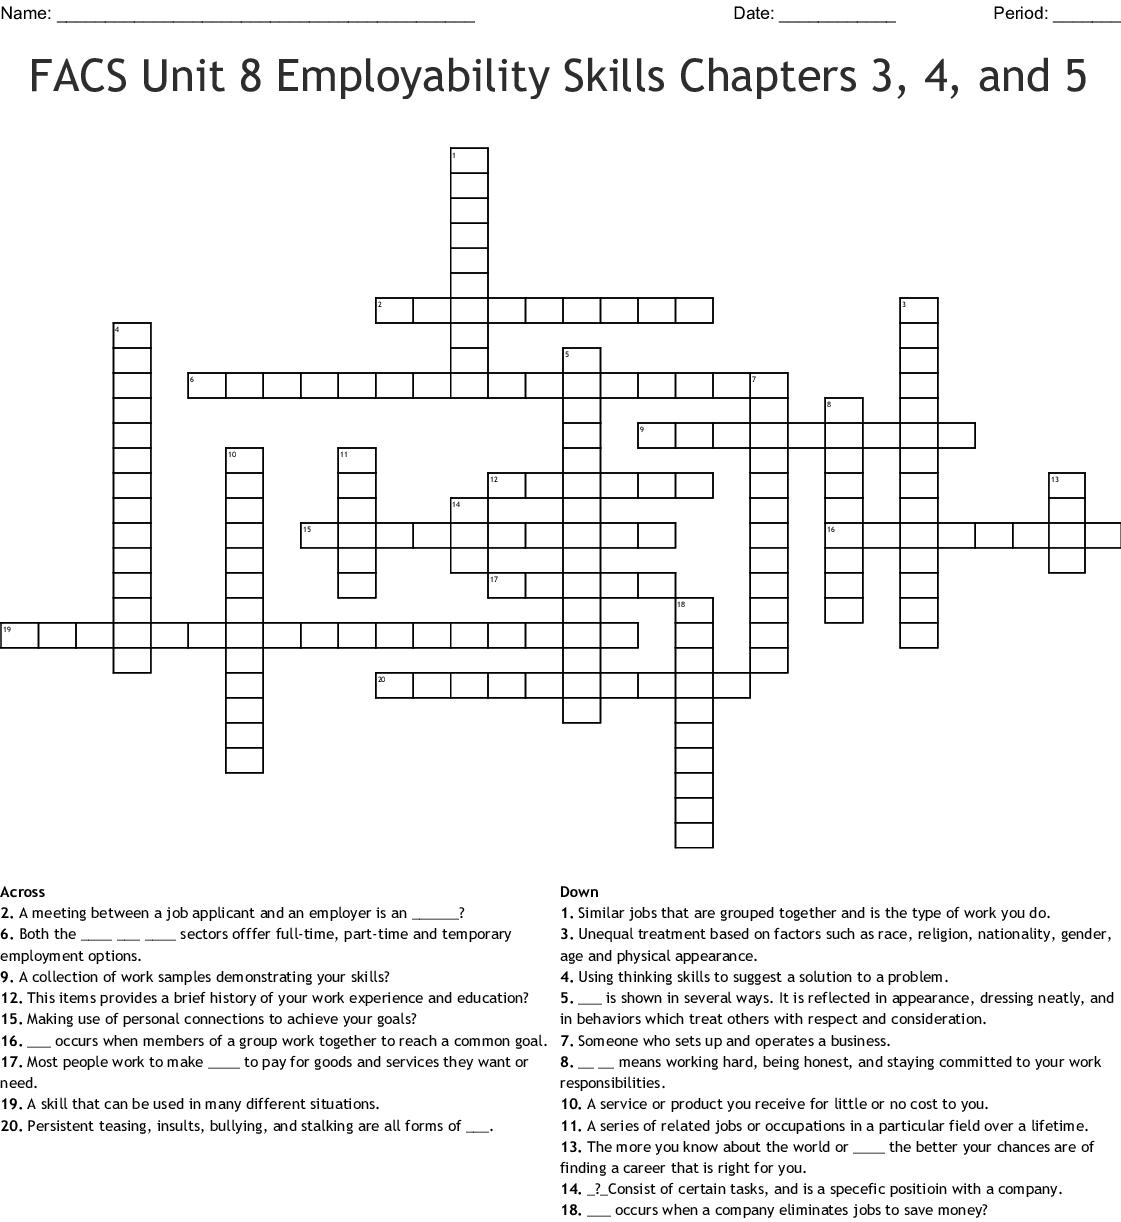 Facs Unit 8 Employability Skills Chapters 3 4 And 5 Crossword Wordmint